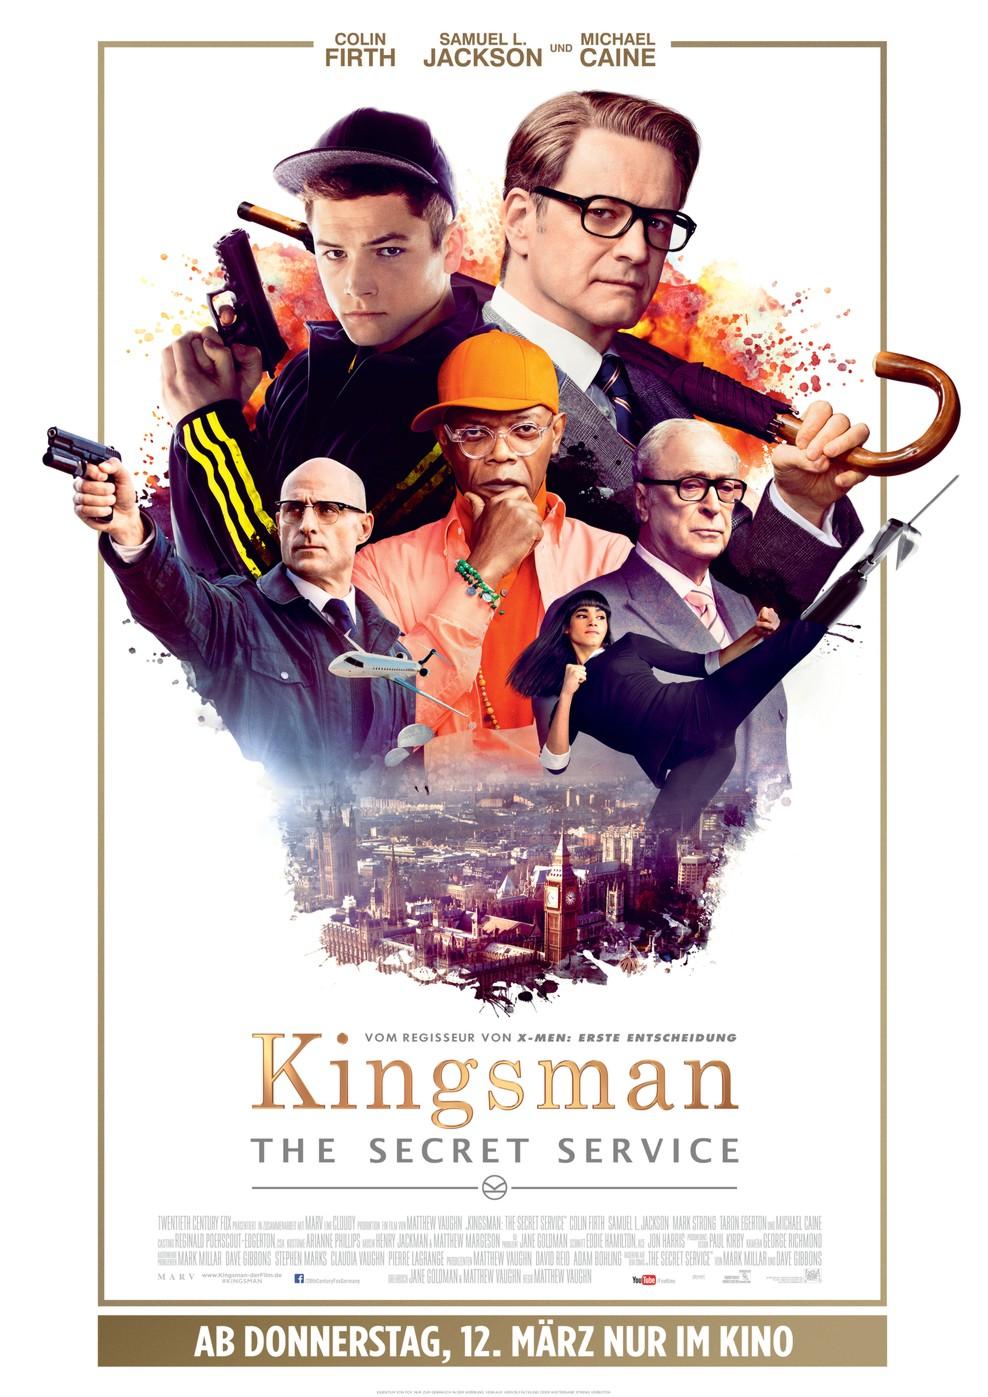 Kingsman - The Secret Service (Poster)